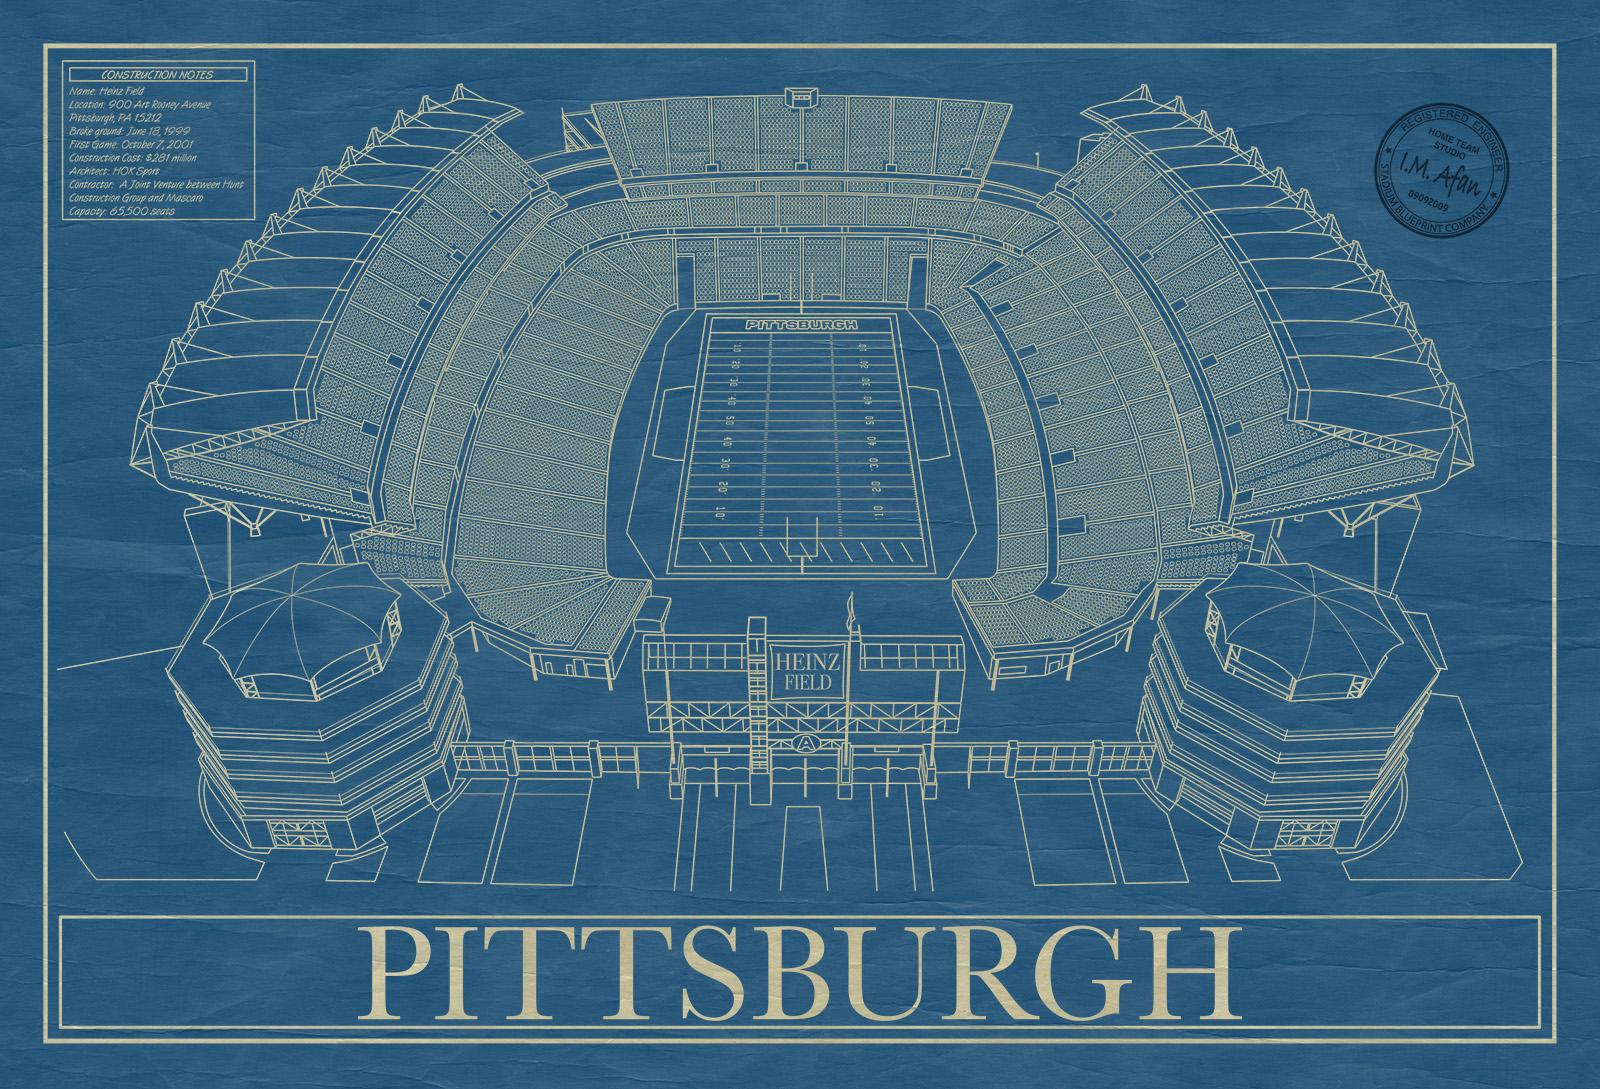 Pittsburgh heinz field stadium blueprint company pittsburgh heinz field malvernweather Images